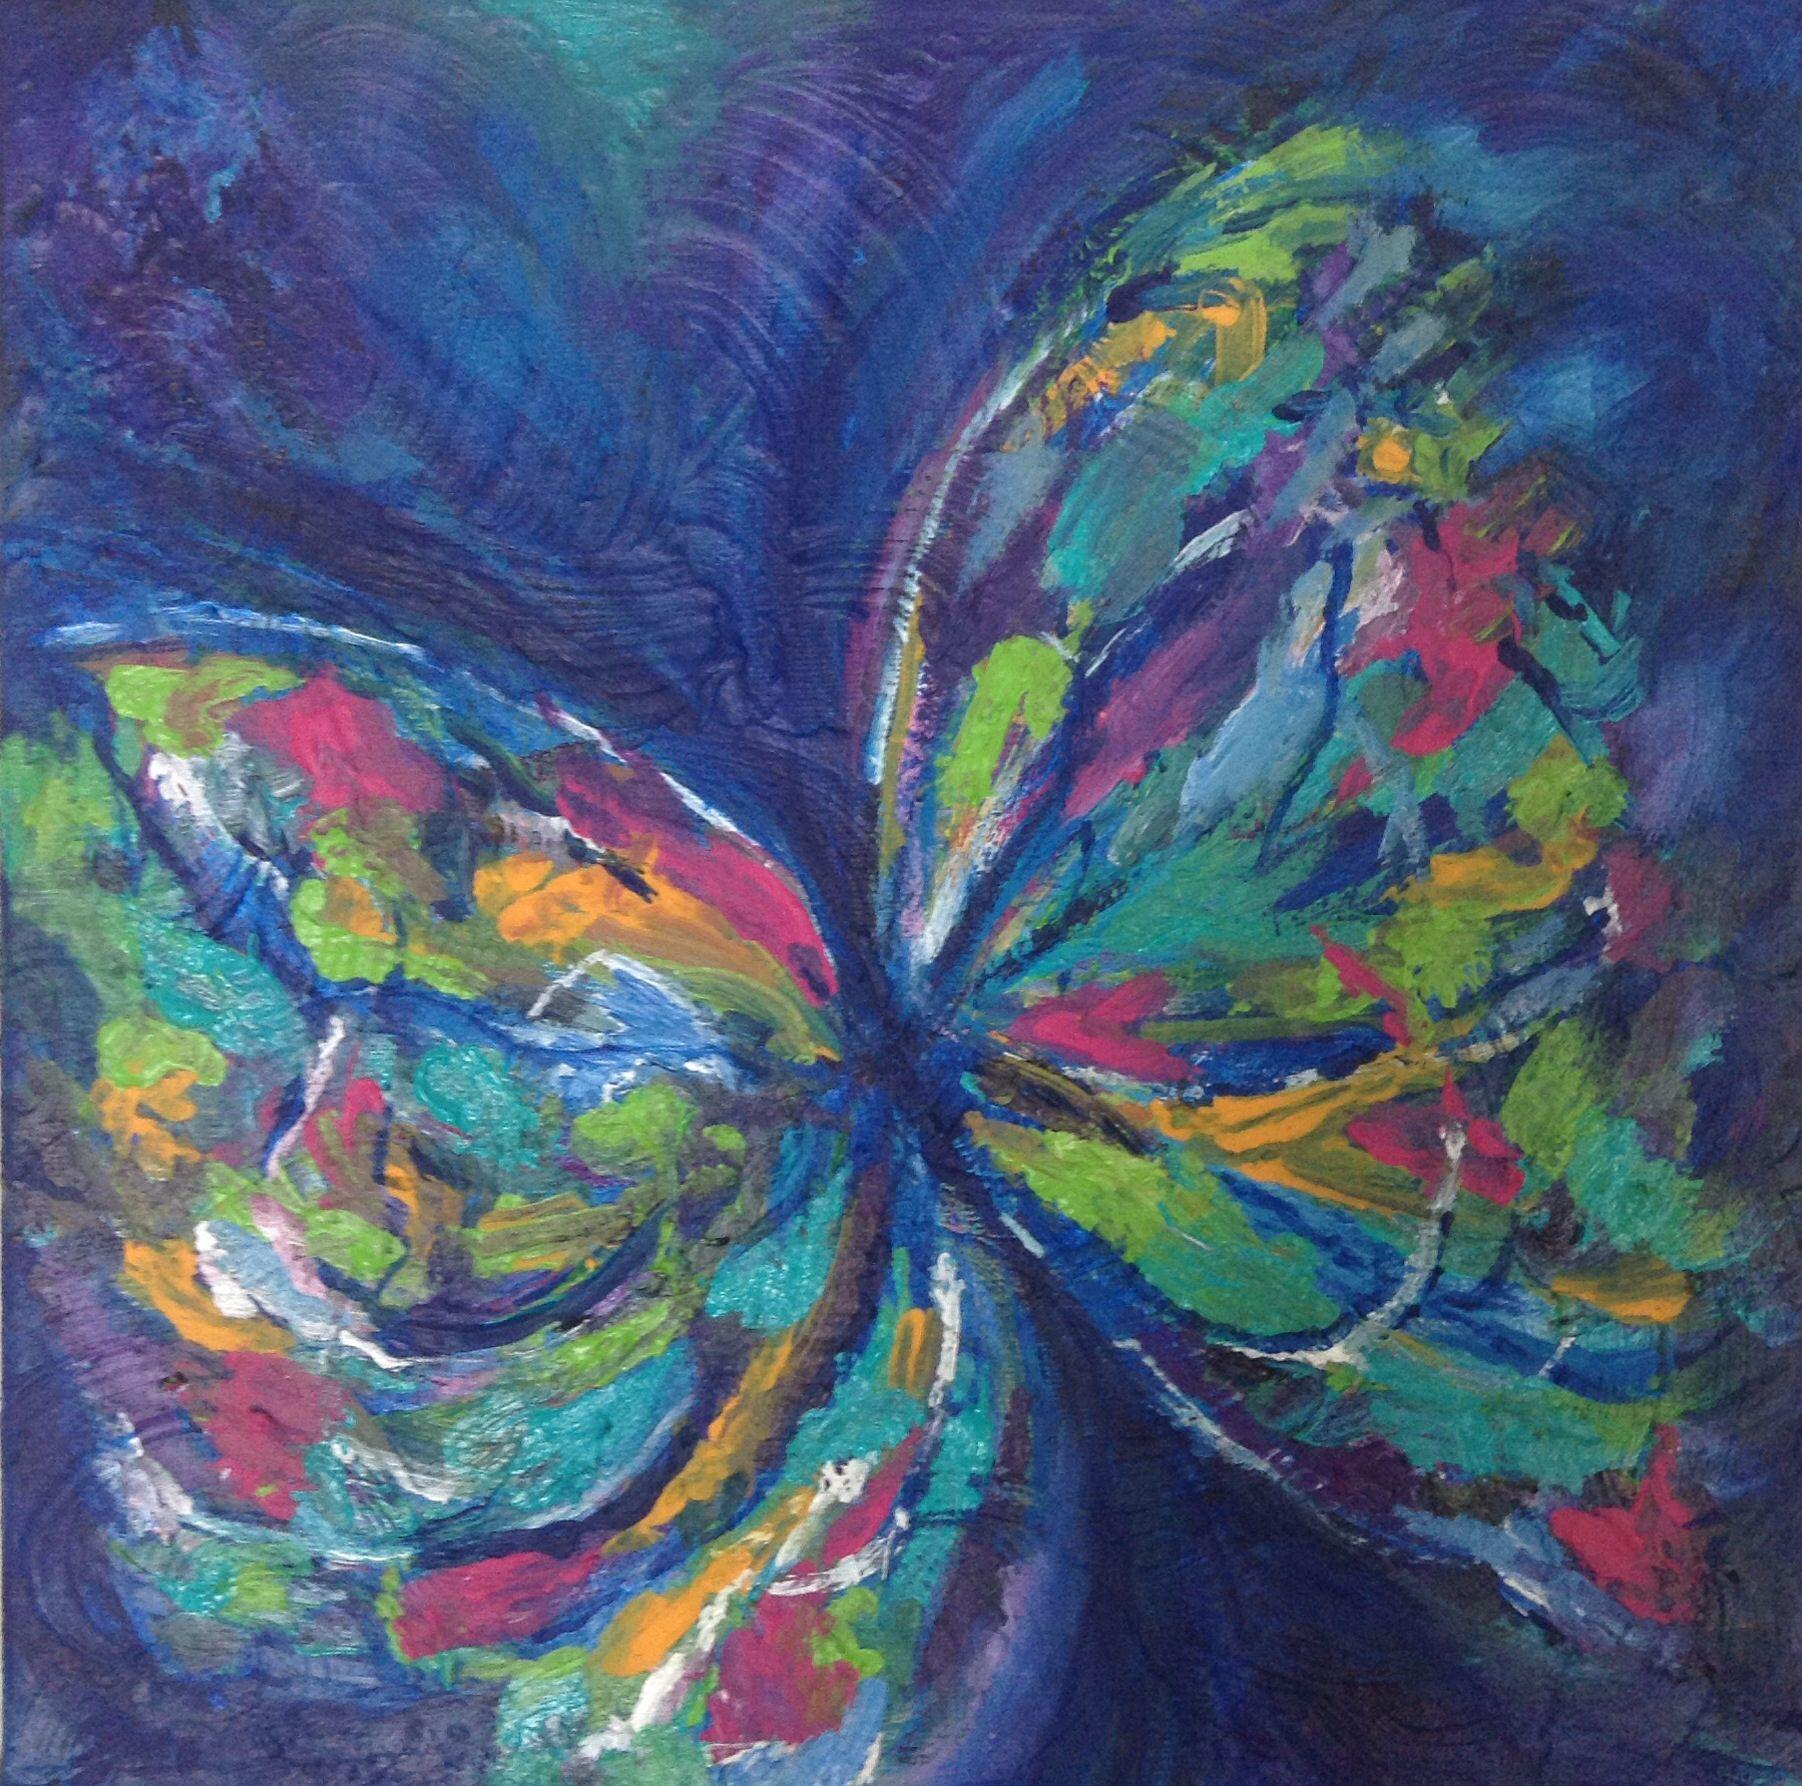 Butterfly, Acrylic, Art | Artists that inspire | Pinterest